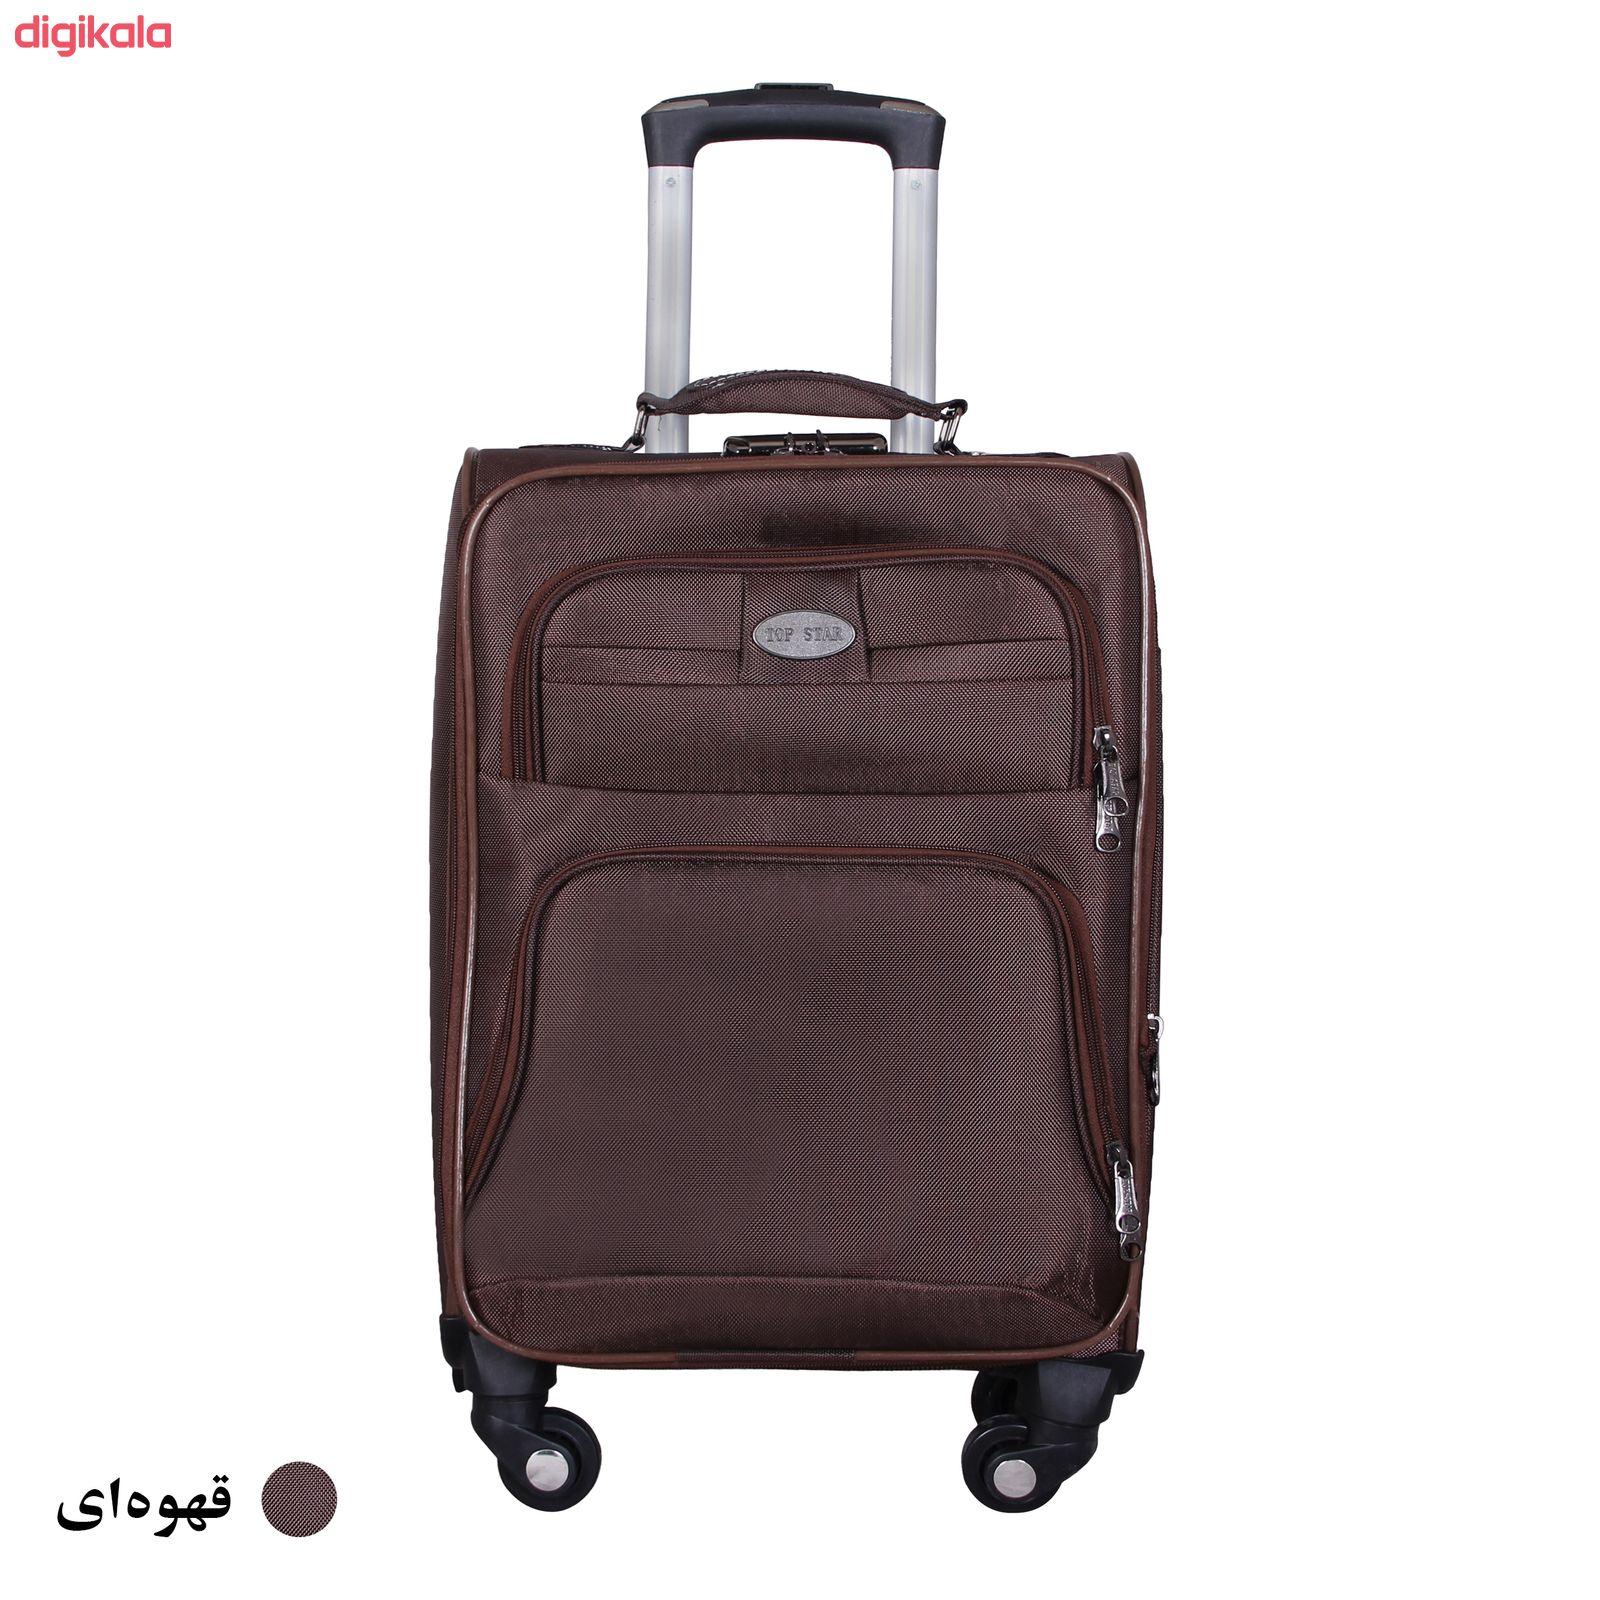 مجموعه سه عددی چمدان کدA1034 main 1 6